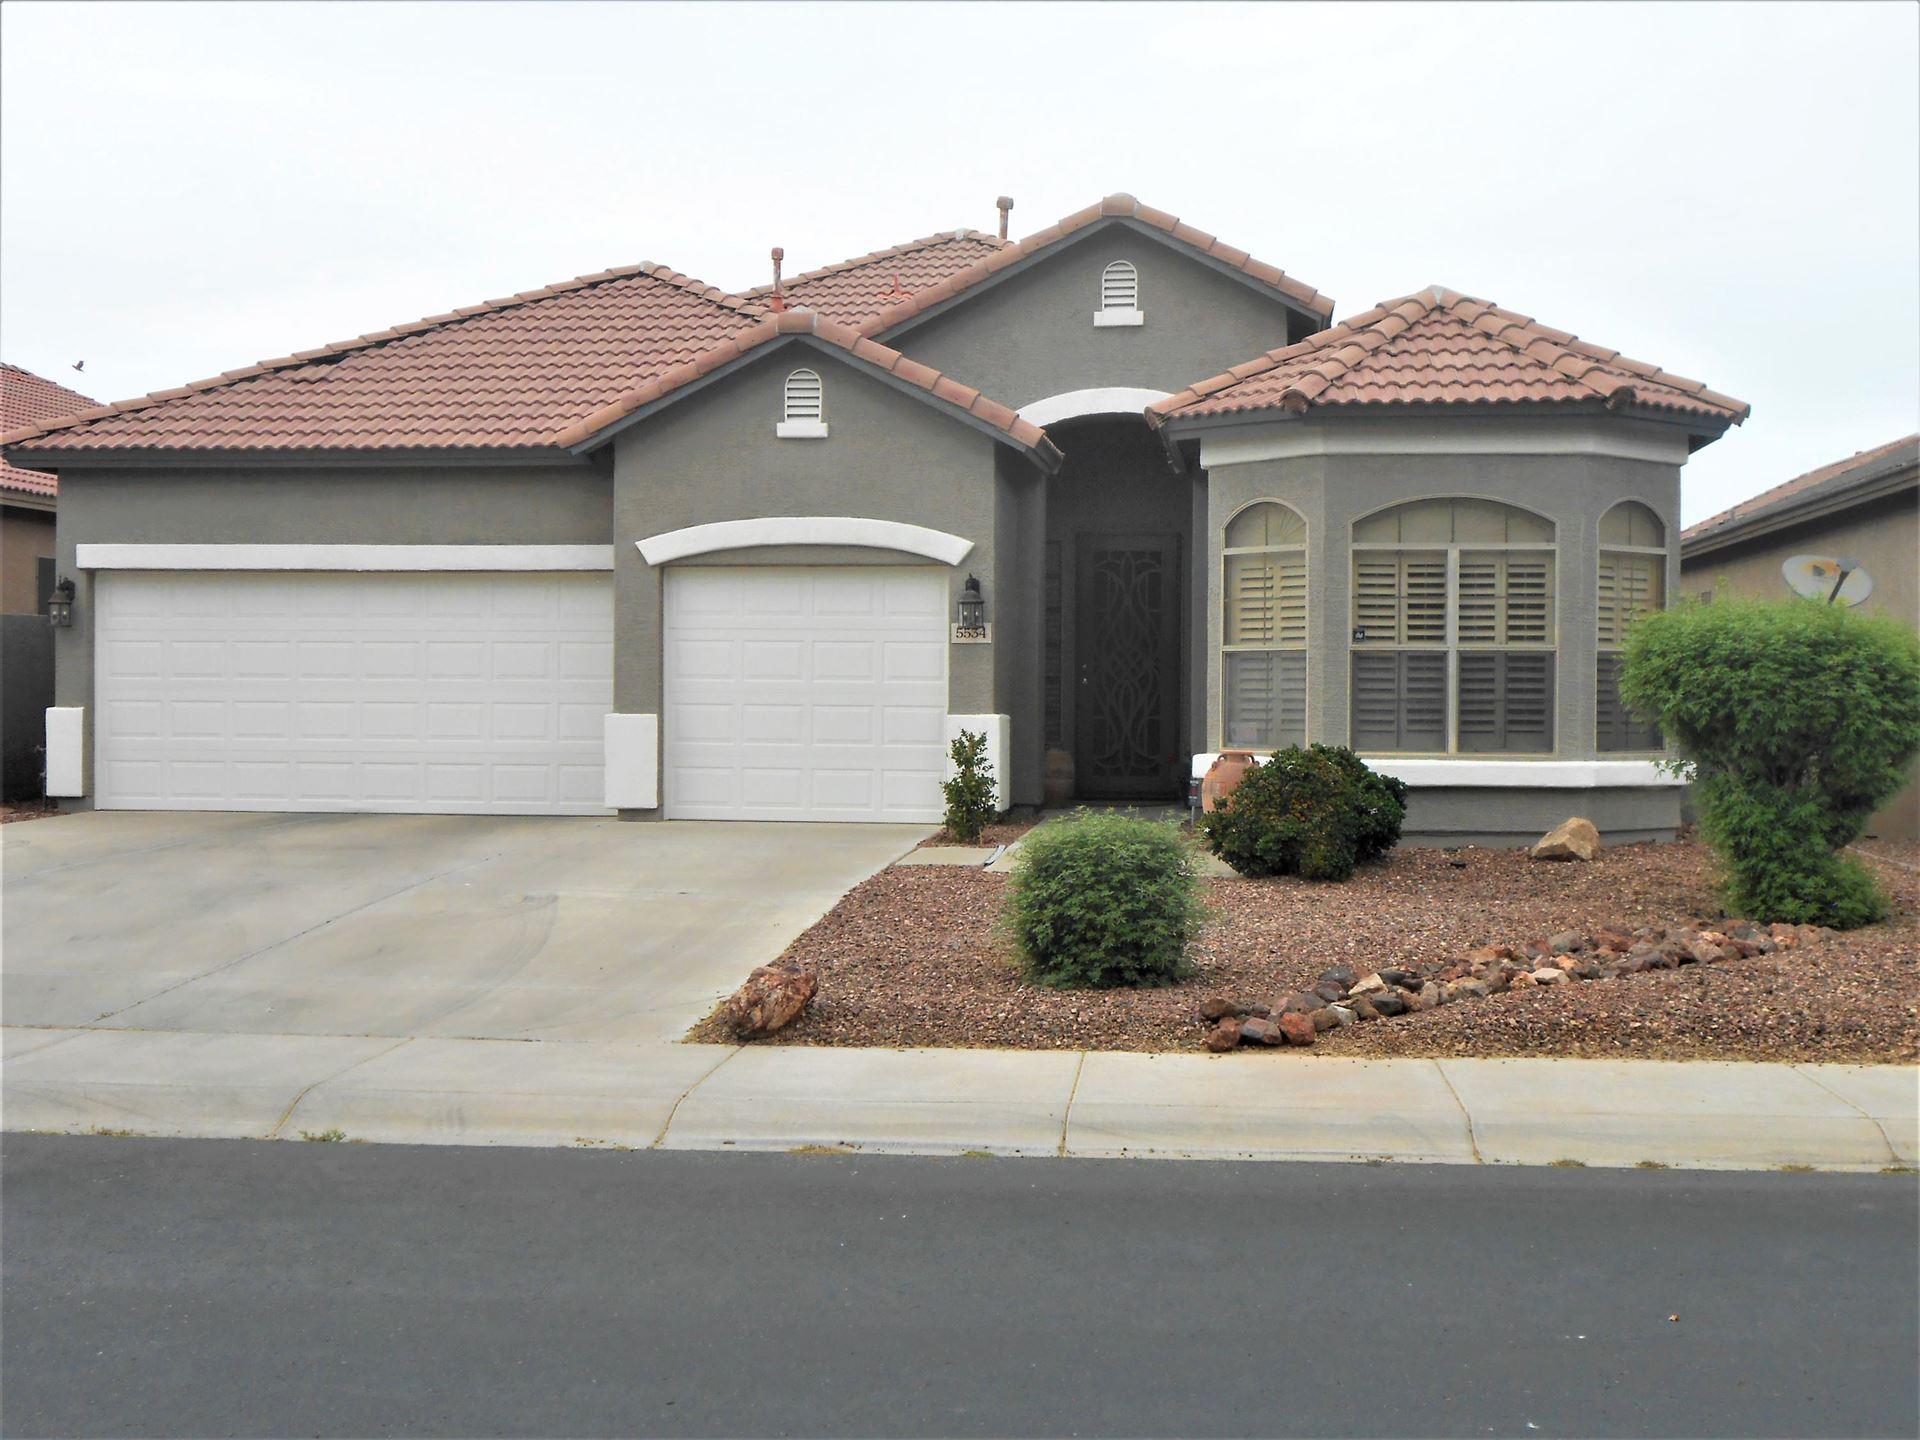 5534 W CARSON Road, Laveen, AZ 85339 - MLS#: 6235818